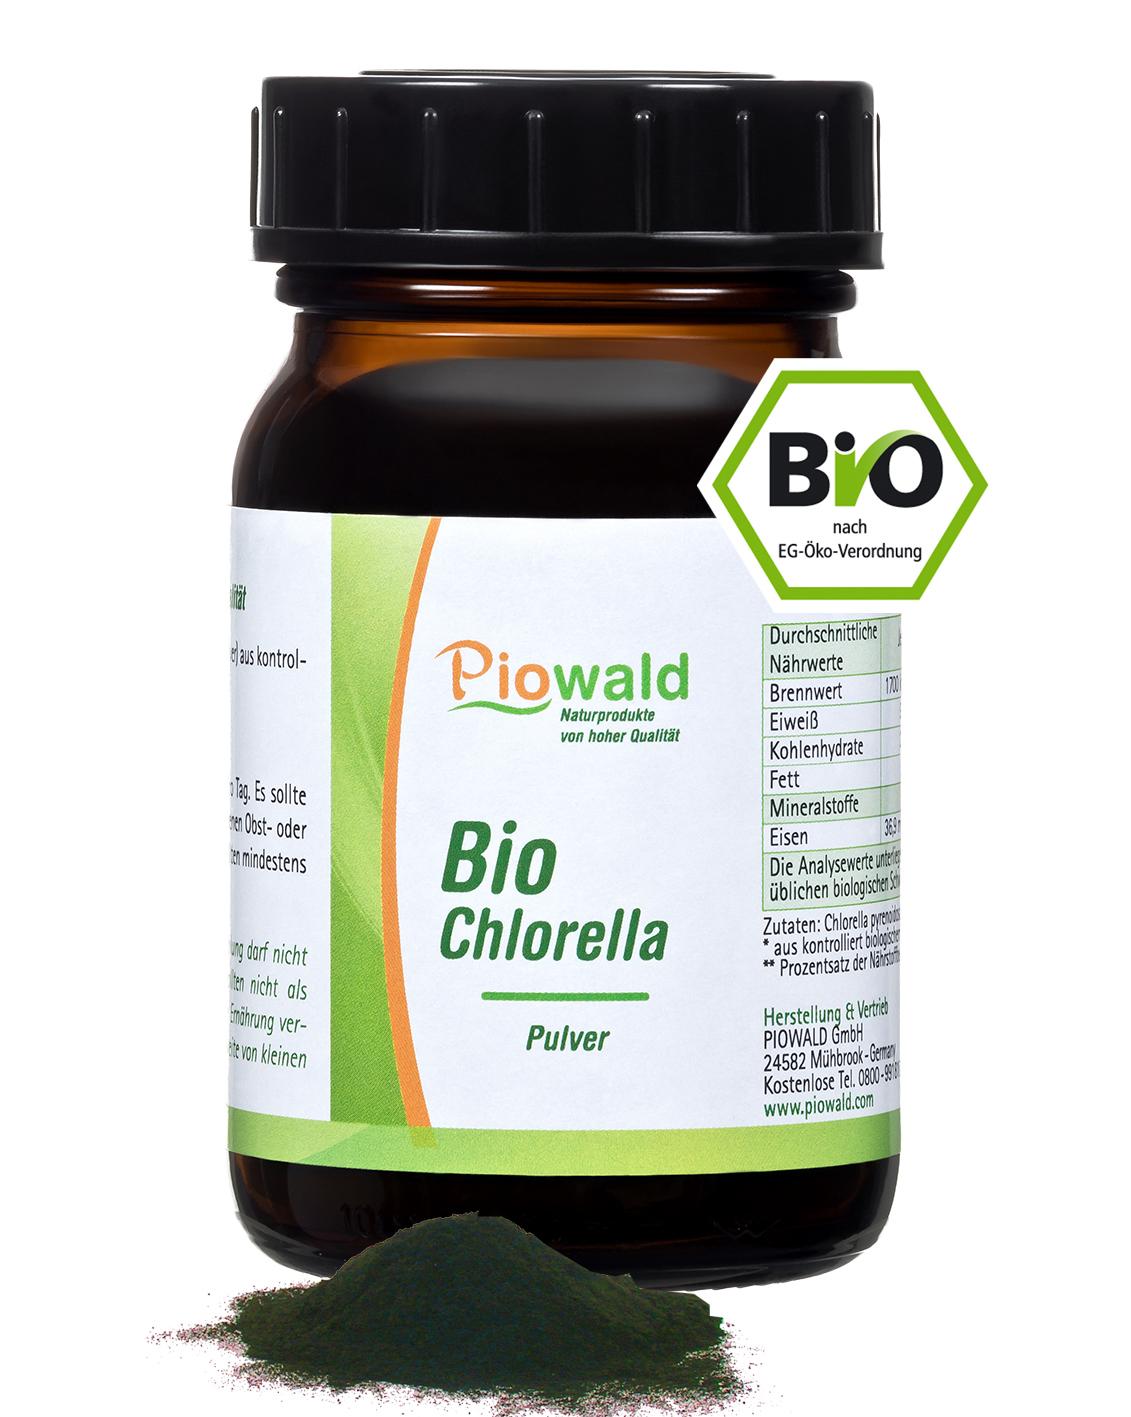 bio chlorella pulver 100g im braunglas piowald gmbh. Black Bedroom Furniture Sets. Home Design Ideas